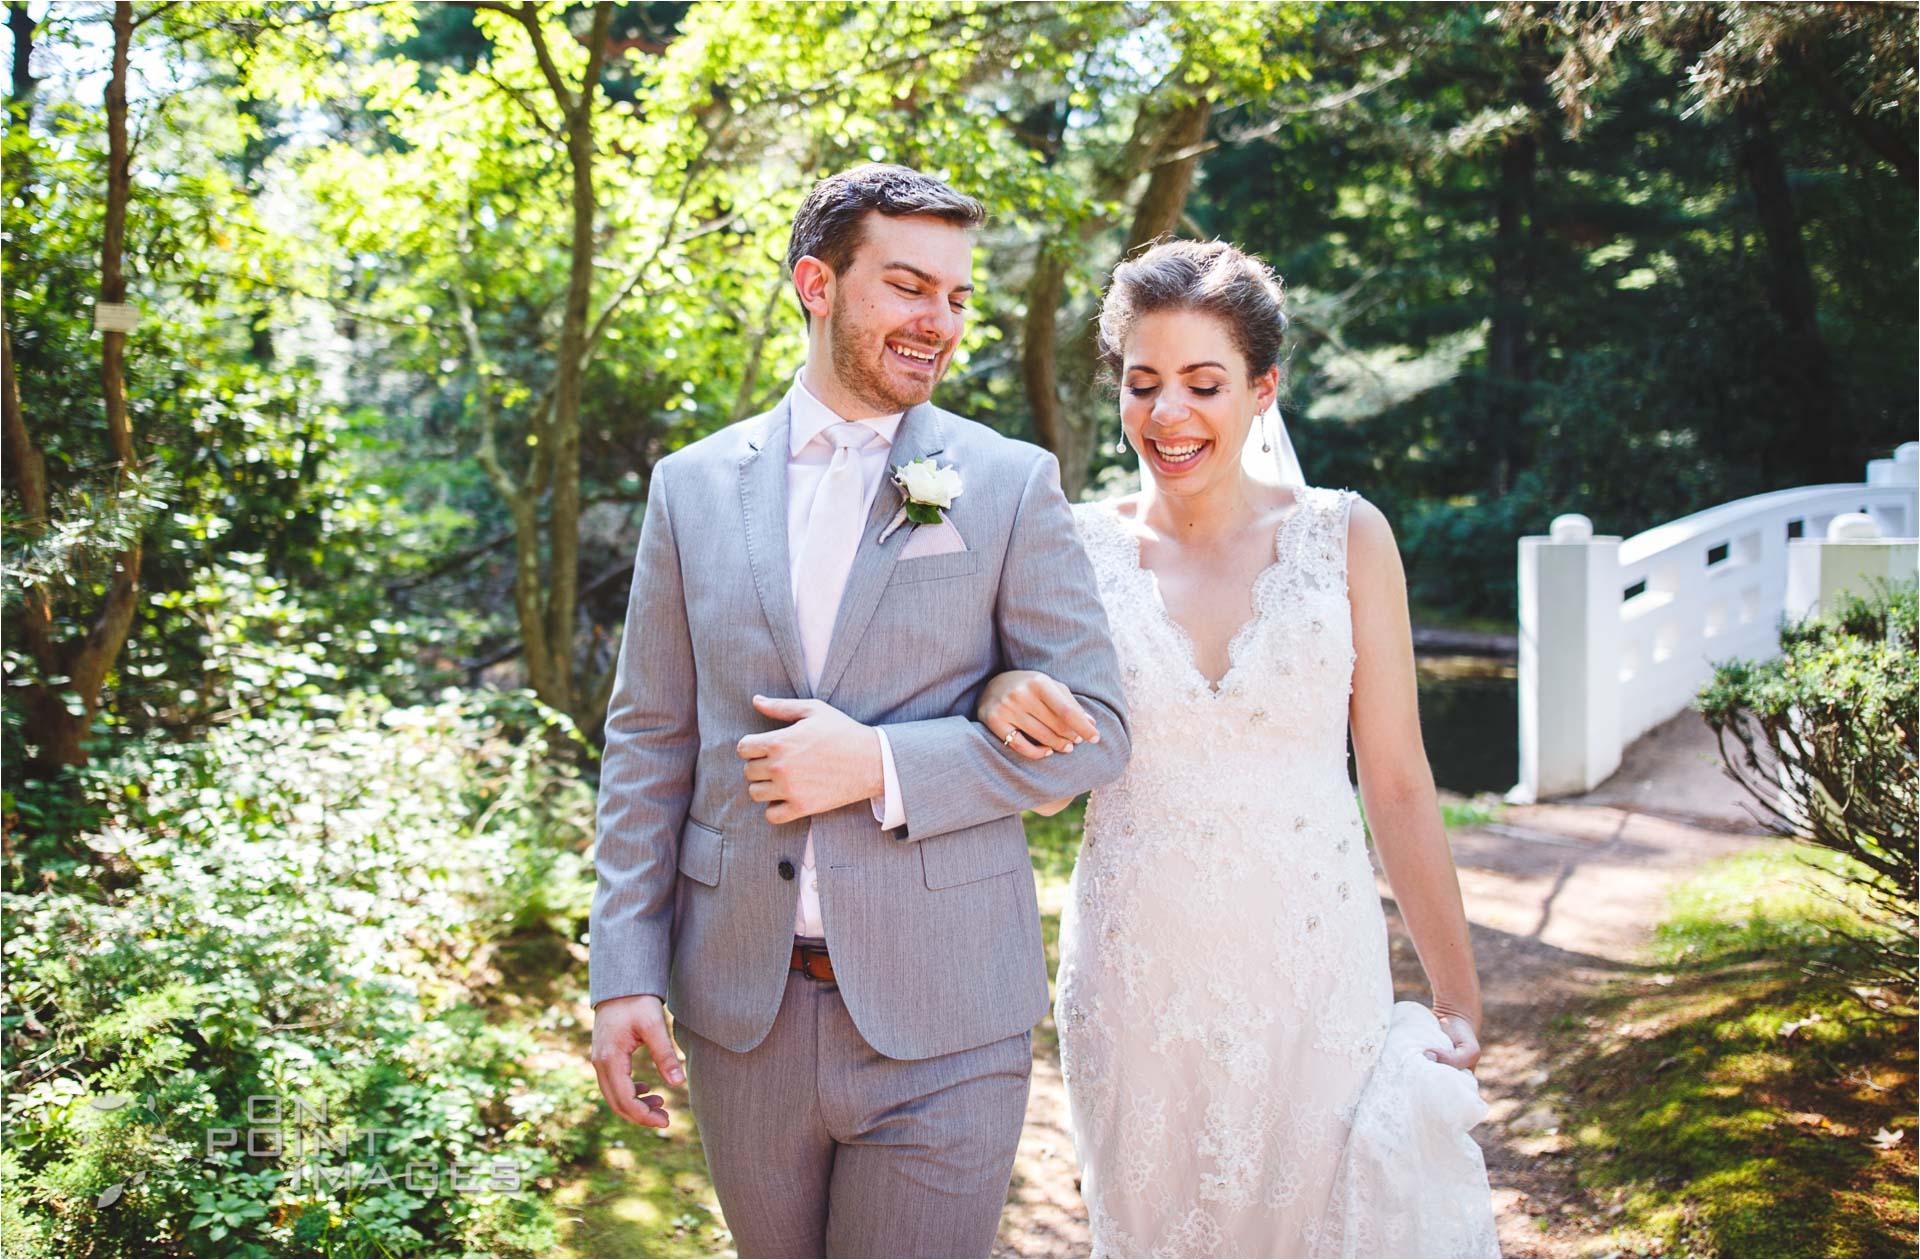 wickham-park-wedding-photographer-ct-15.jpg